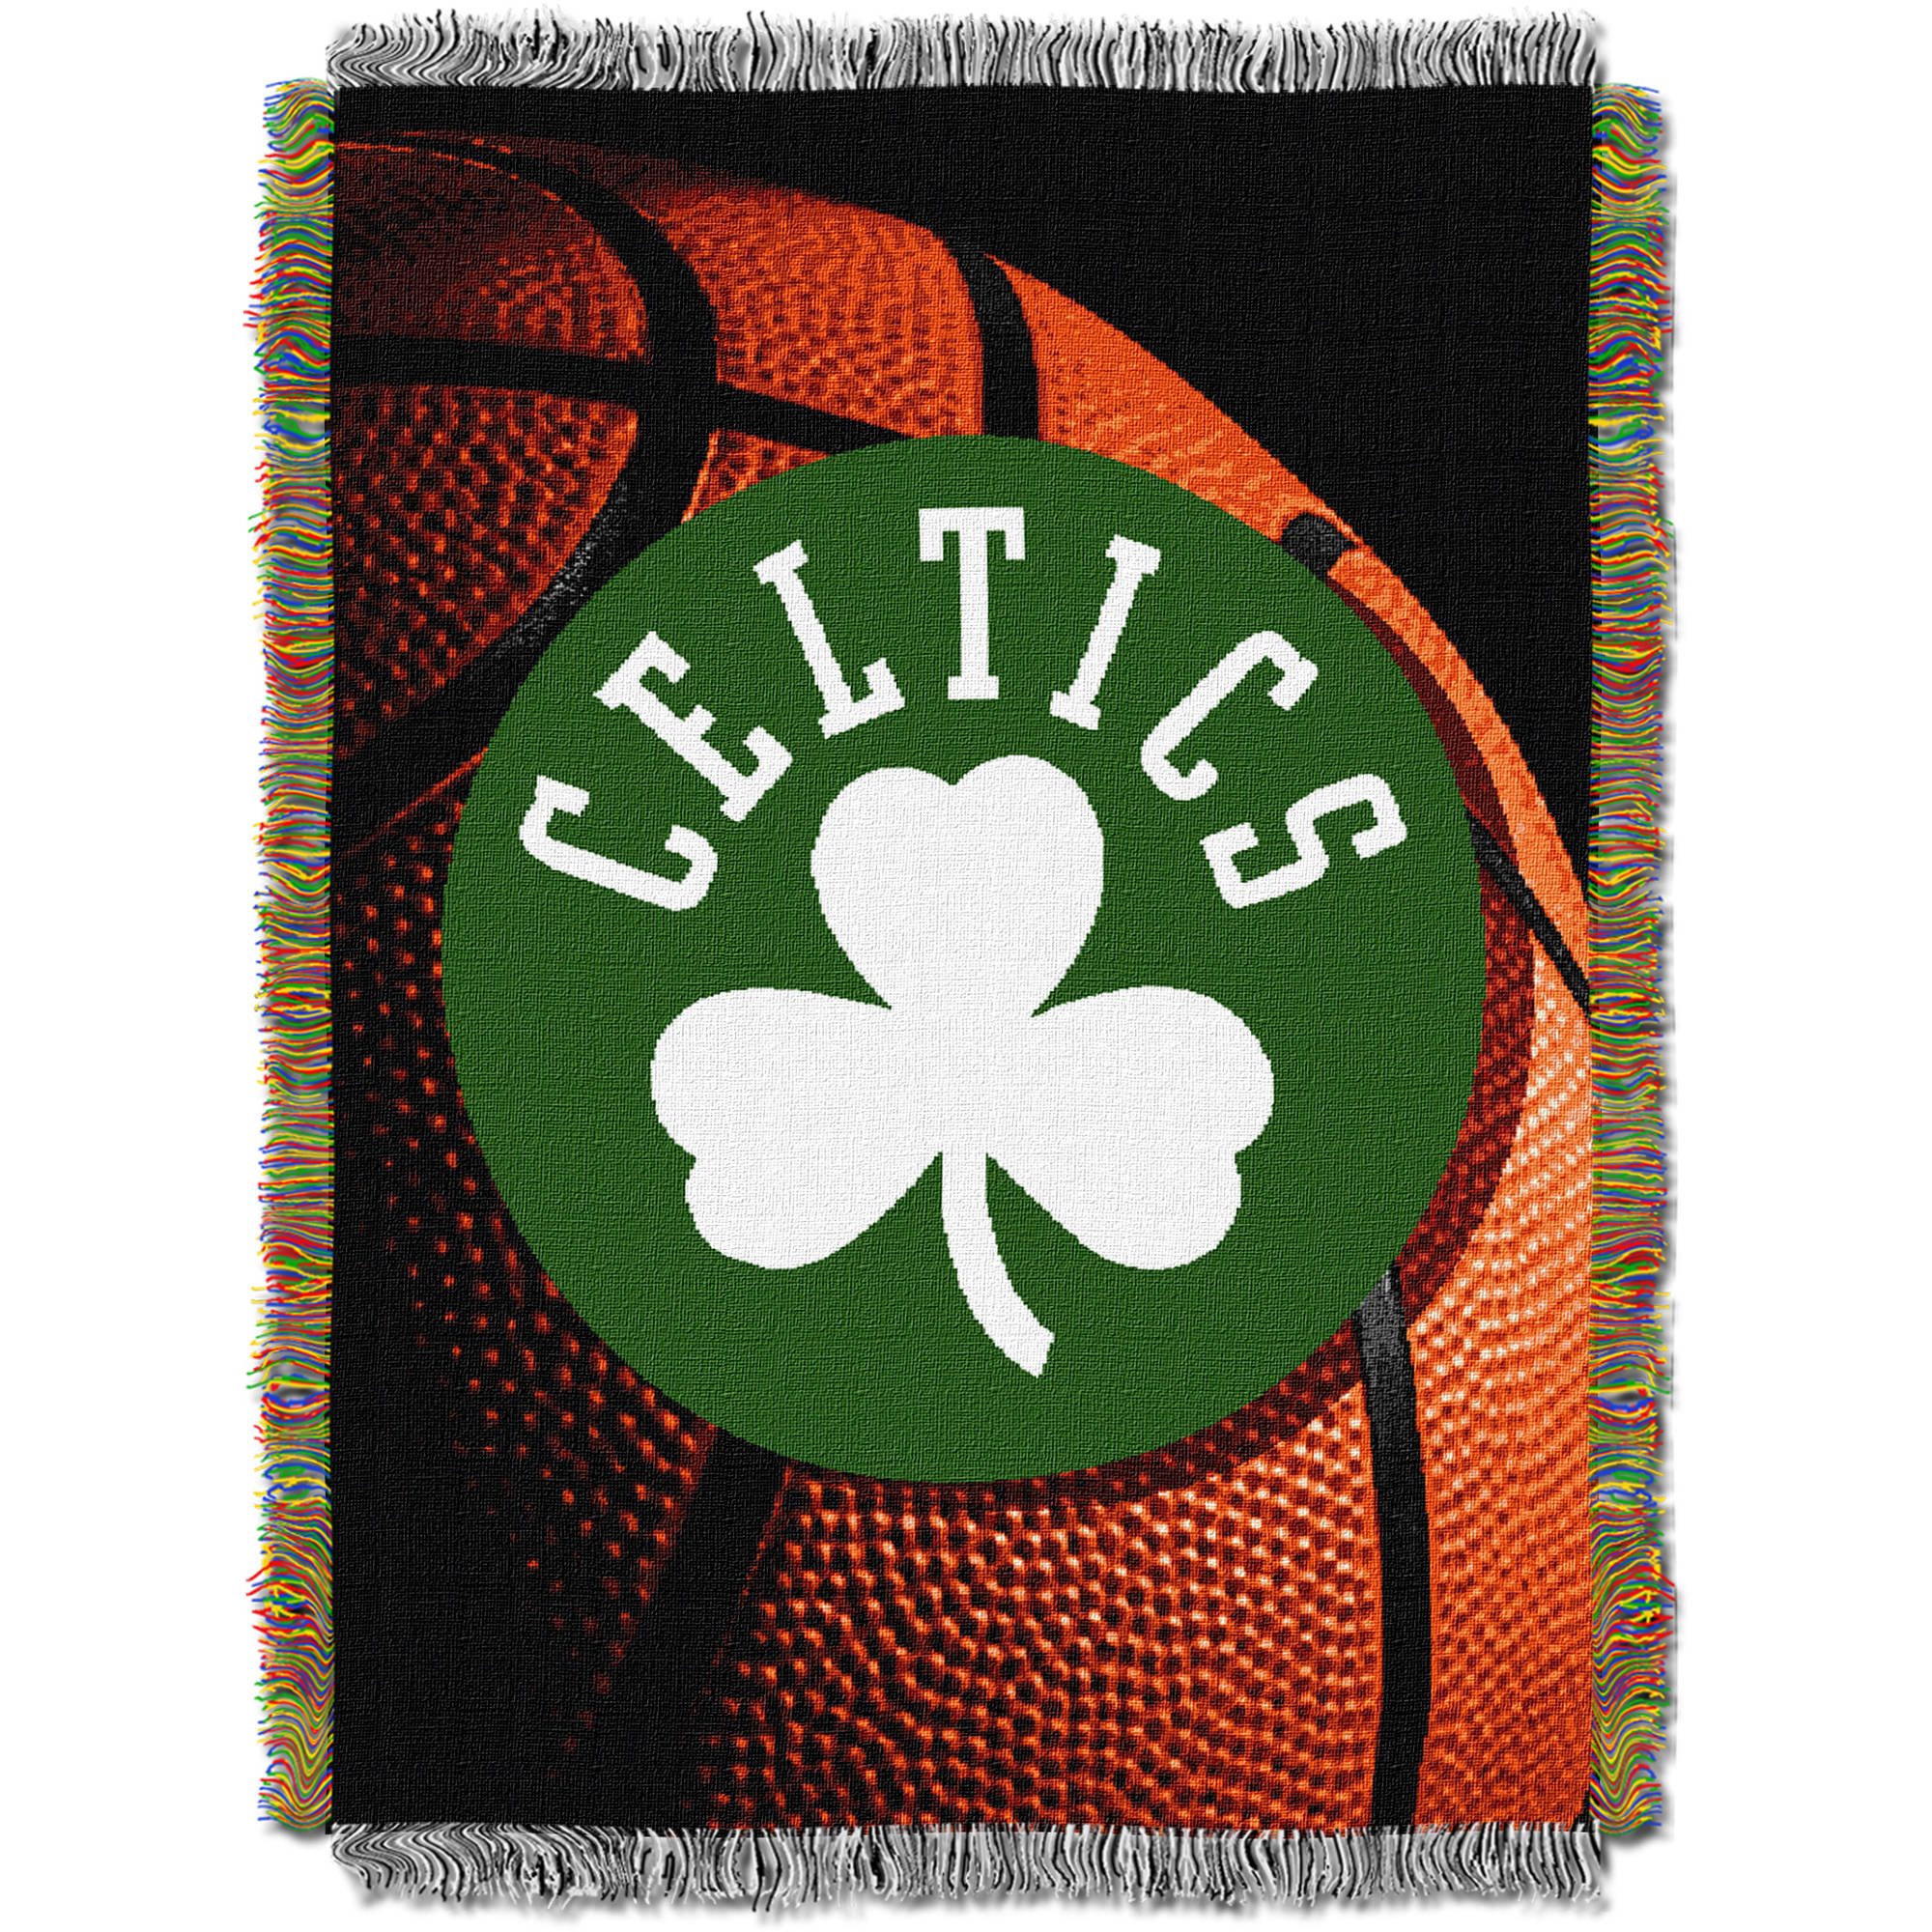 "NBA 48"" x 60"" Photo Real Series Tapestry Throw, Celtics"